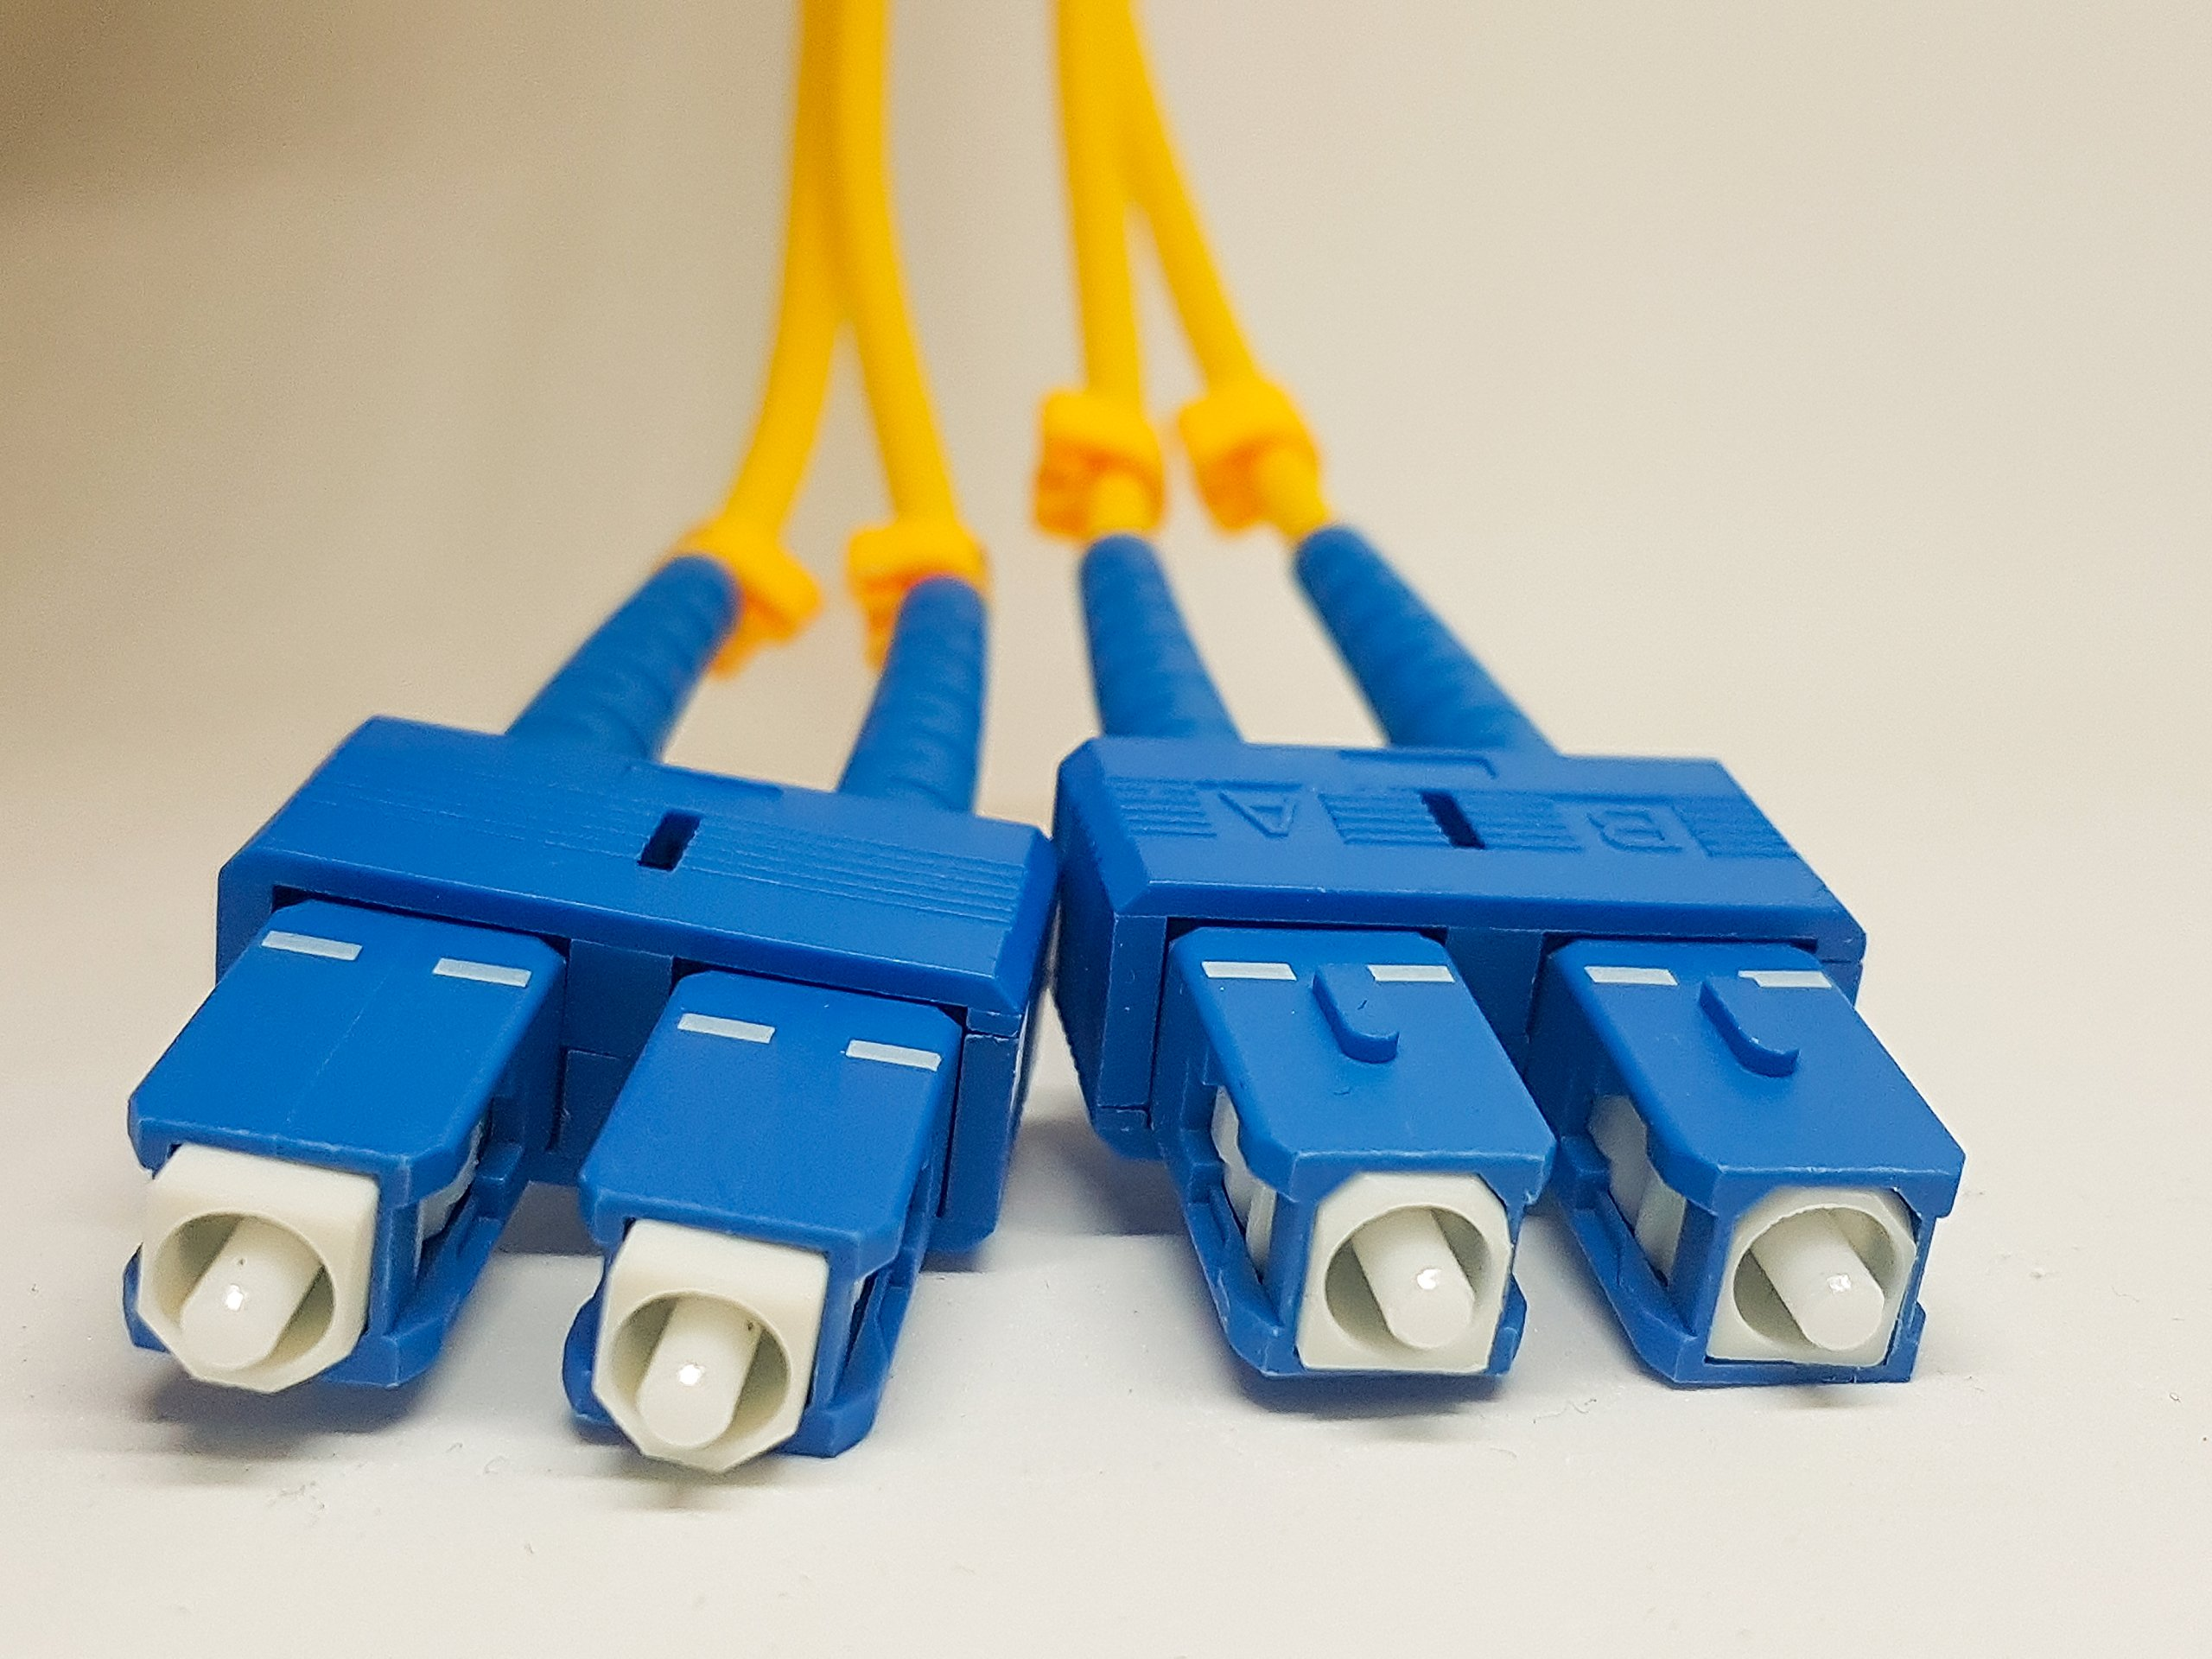 SC to SC SingleMode 15M fibre optic patch cable.Israeli Cutting Edge Technology, SC/SC Duplex 9/125 Single Mode 15M (49.21ft) Fiber Patch Cable,Single Mode Fiber Cables SC To SC, 3MM Yellow PVC.